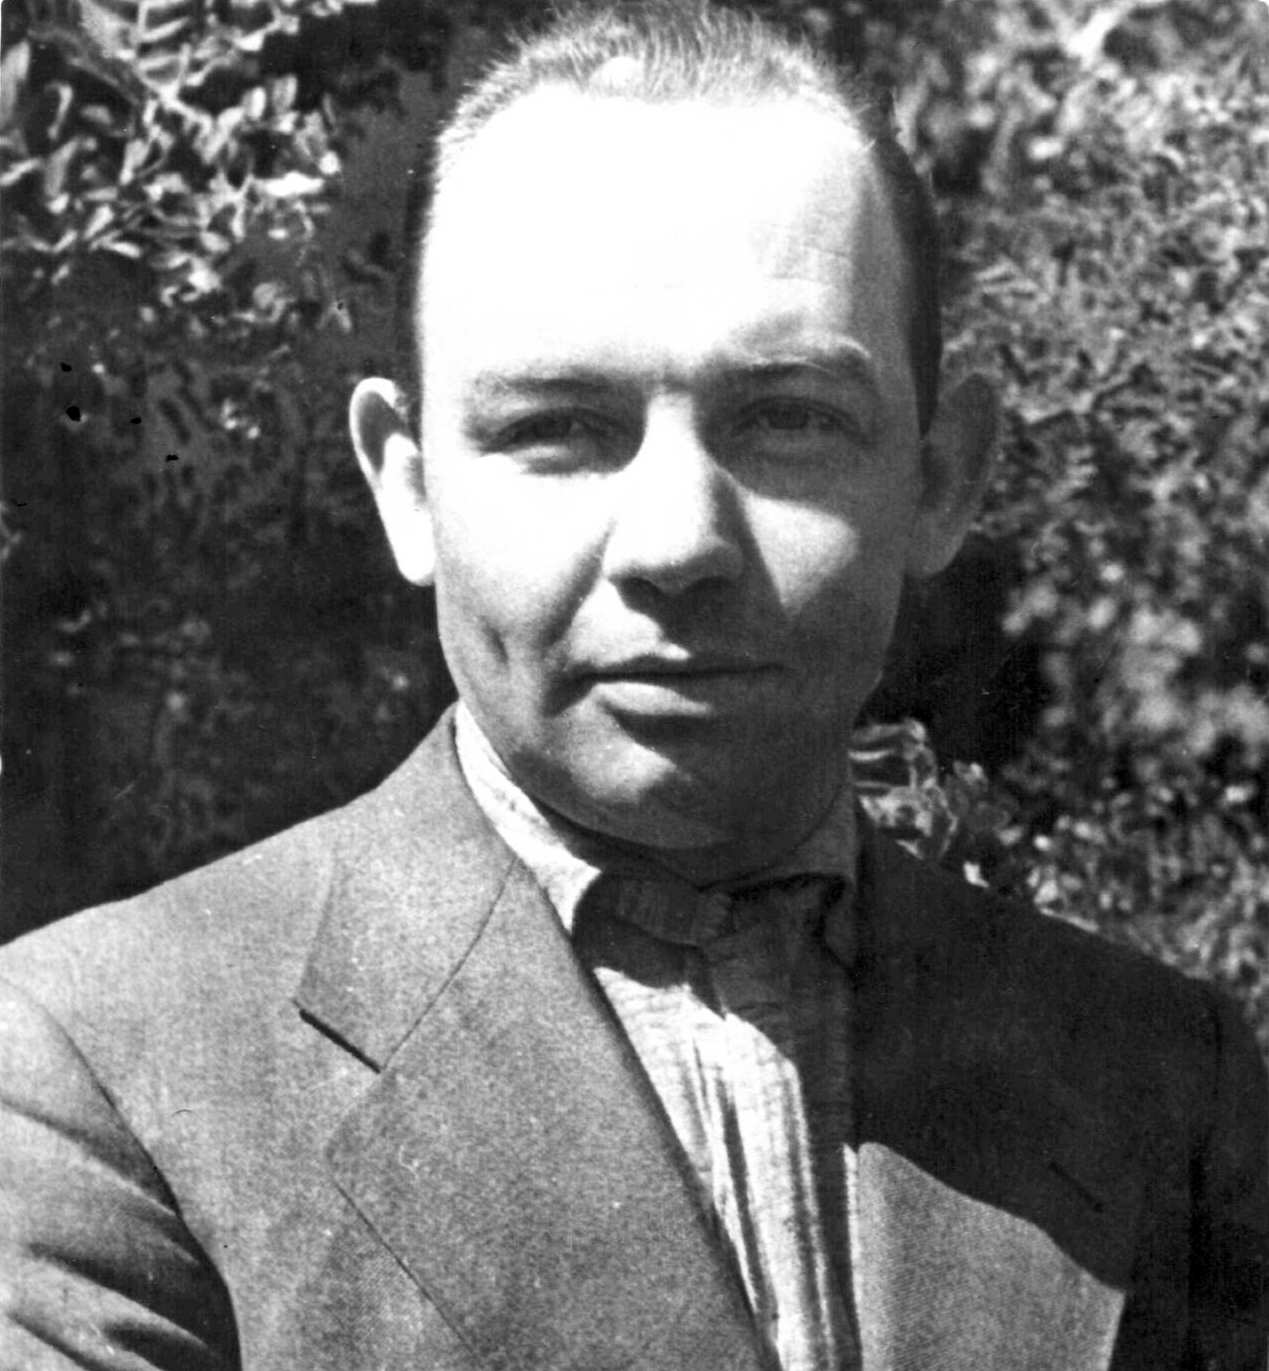 САМГИН Н.А. — кинооператор